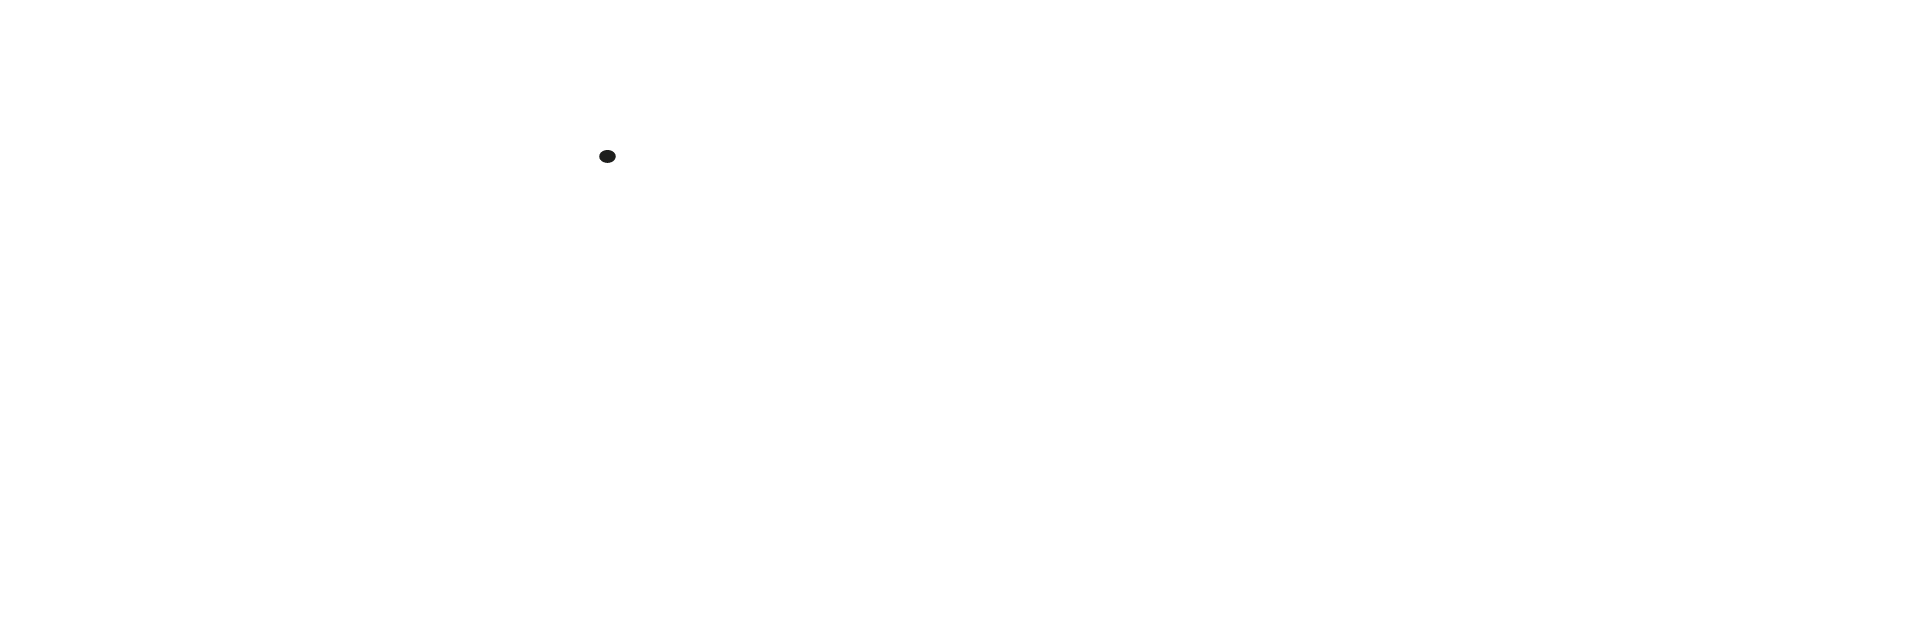 civico21-qualità-carne3-senigallia